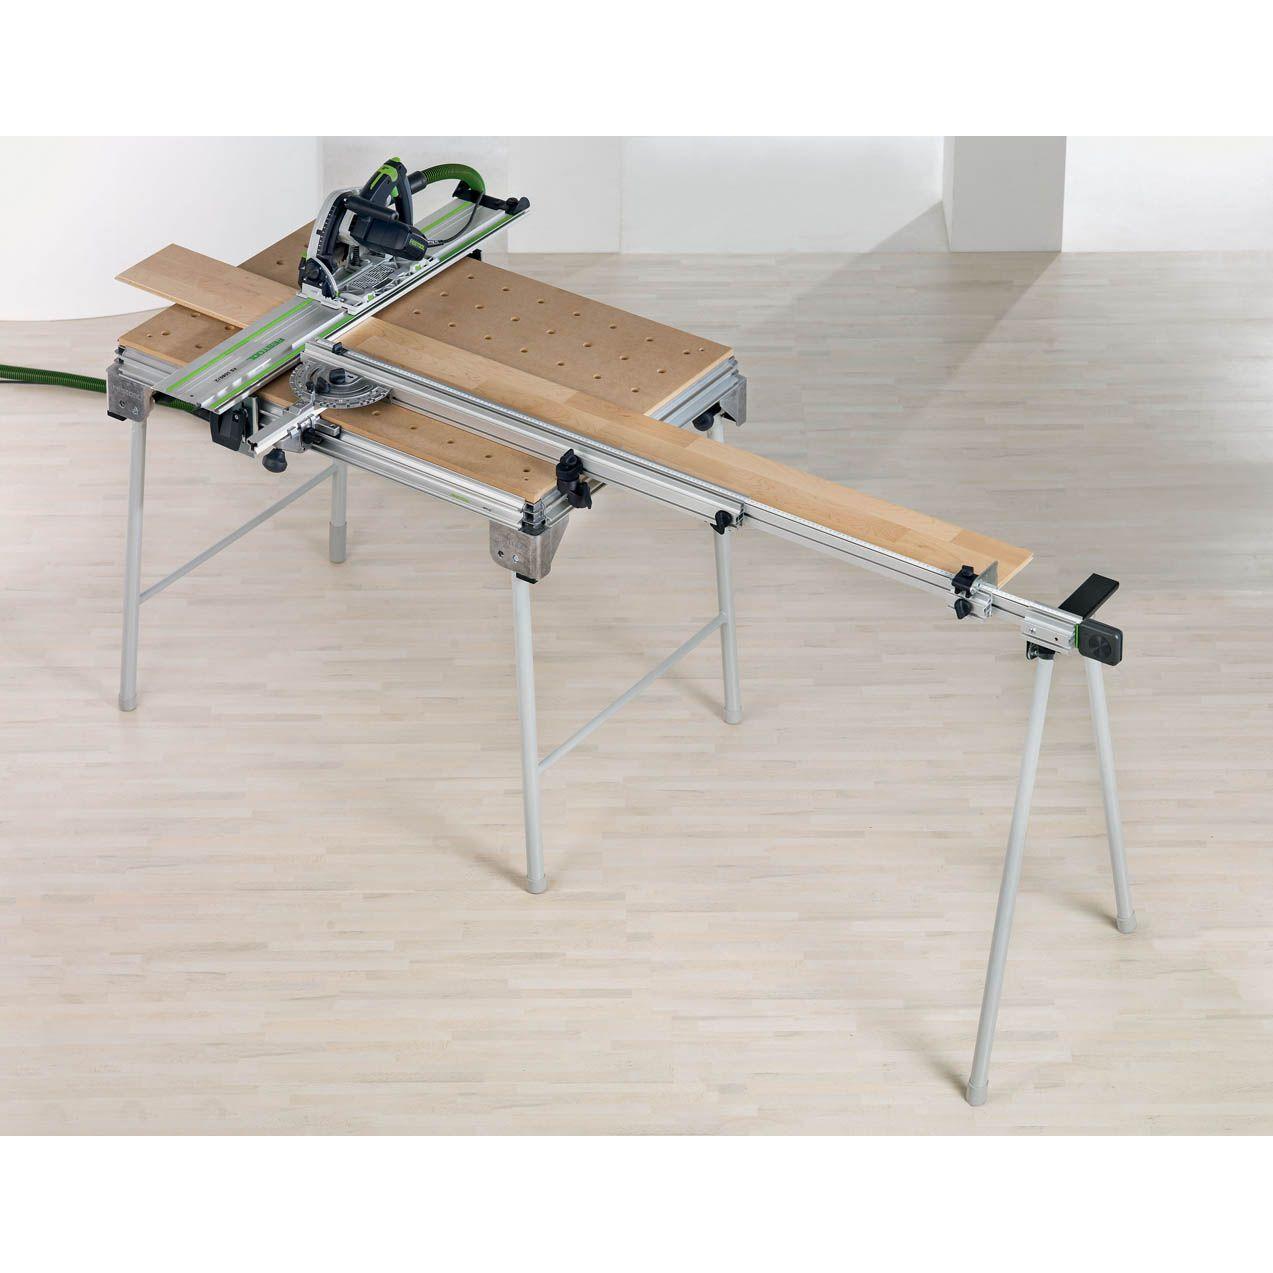 mft 3 large multi function workbench festool australia workbench pinterest woodworking. Black Bedroom Furniture Sets. Home Design Ideas